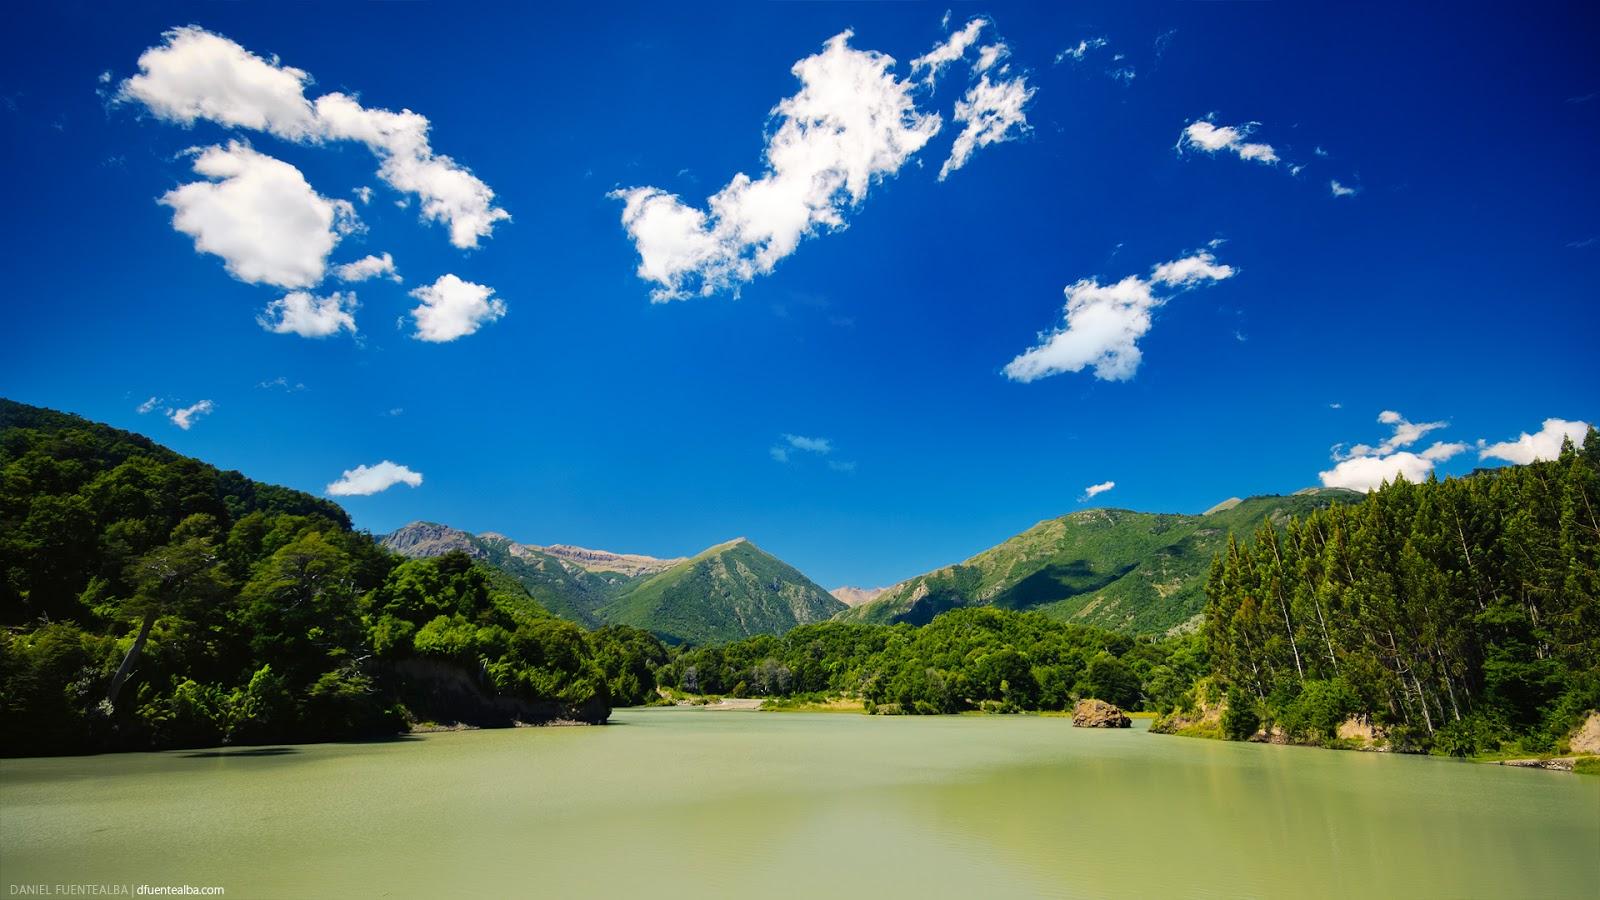 paisajes bonitos